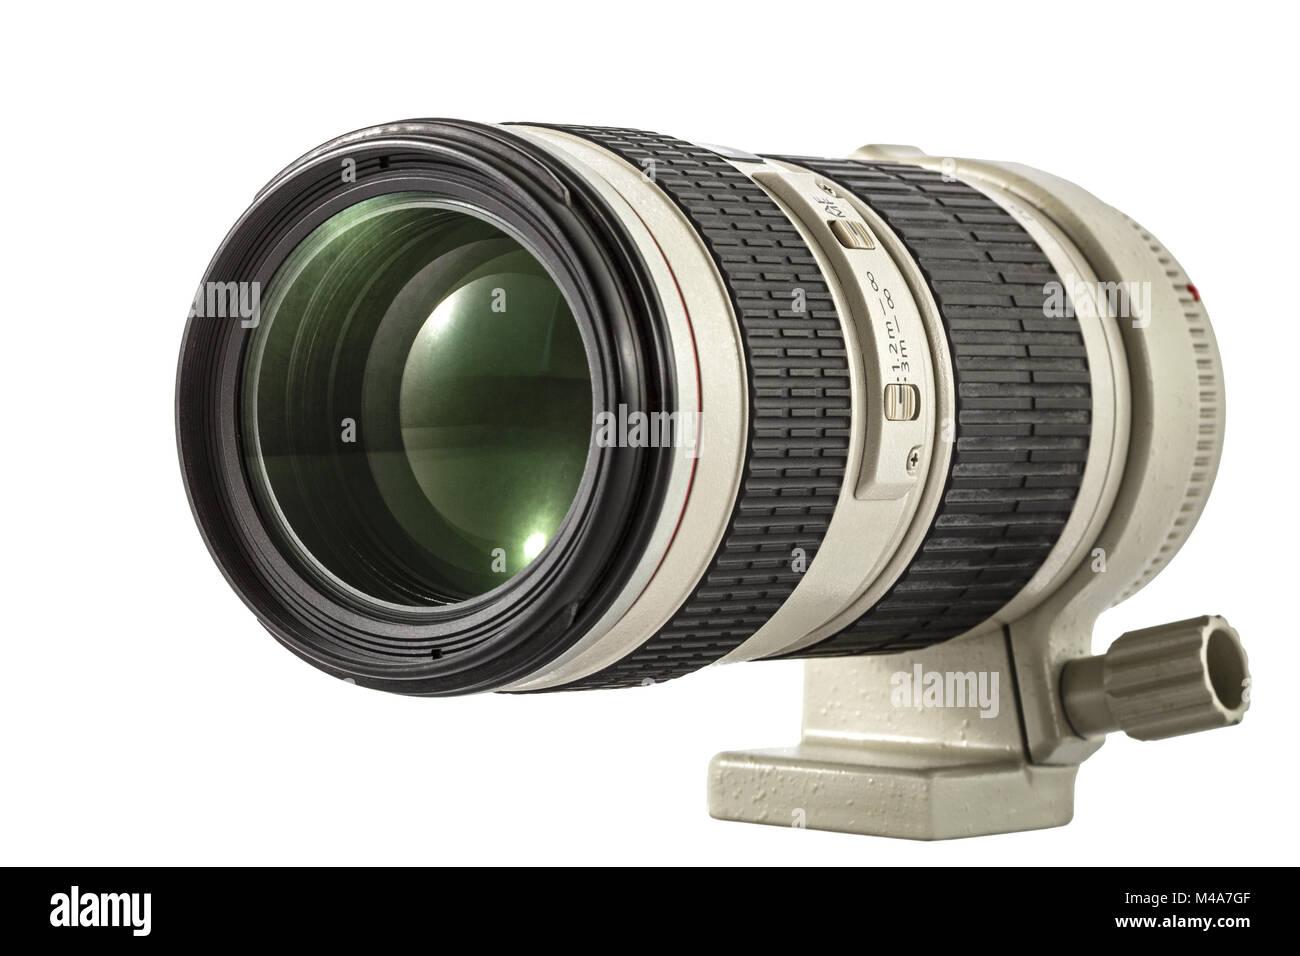 Zoom camera lens, isolated on white background Stock Photo